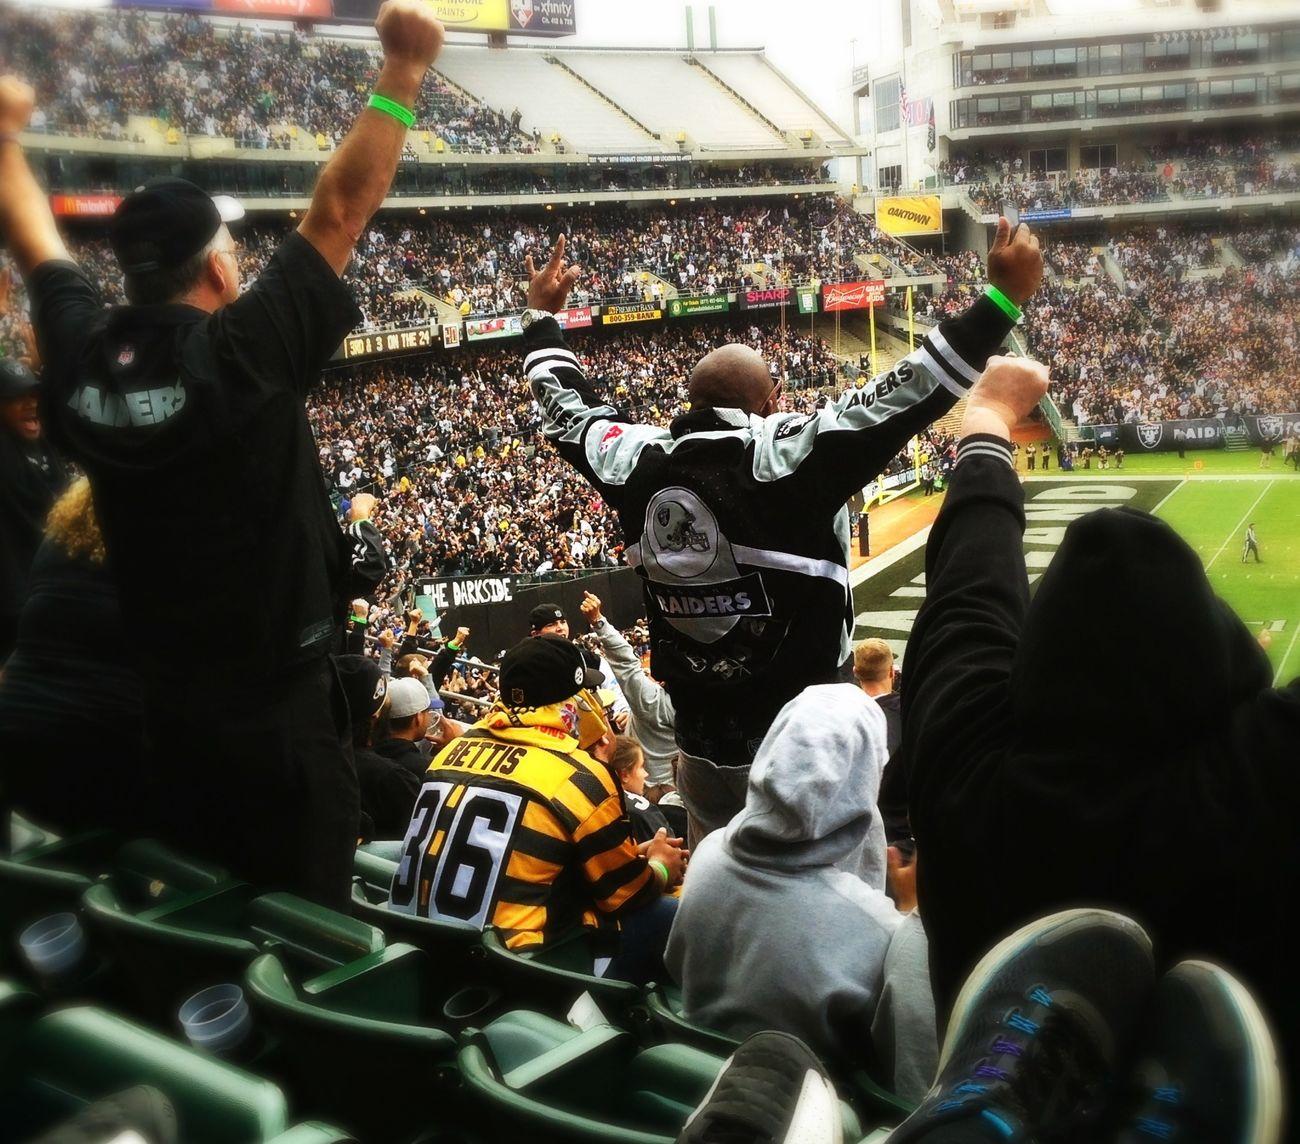 Raiders winning... :) Oakland Raiders Like A Boss Cheering